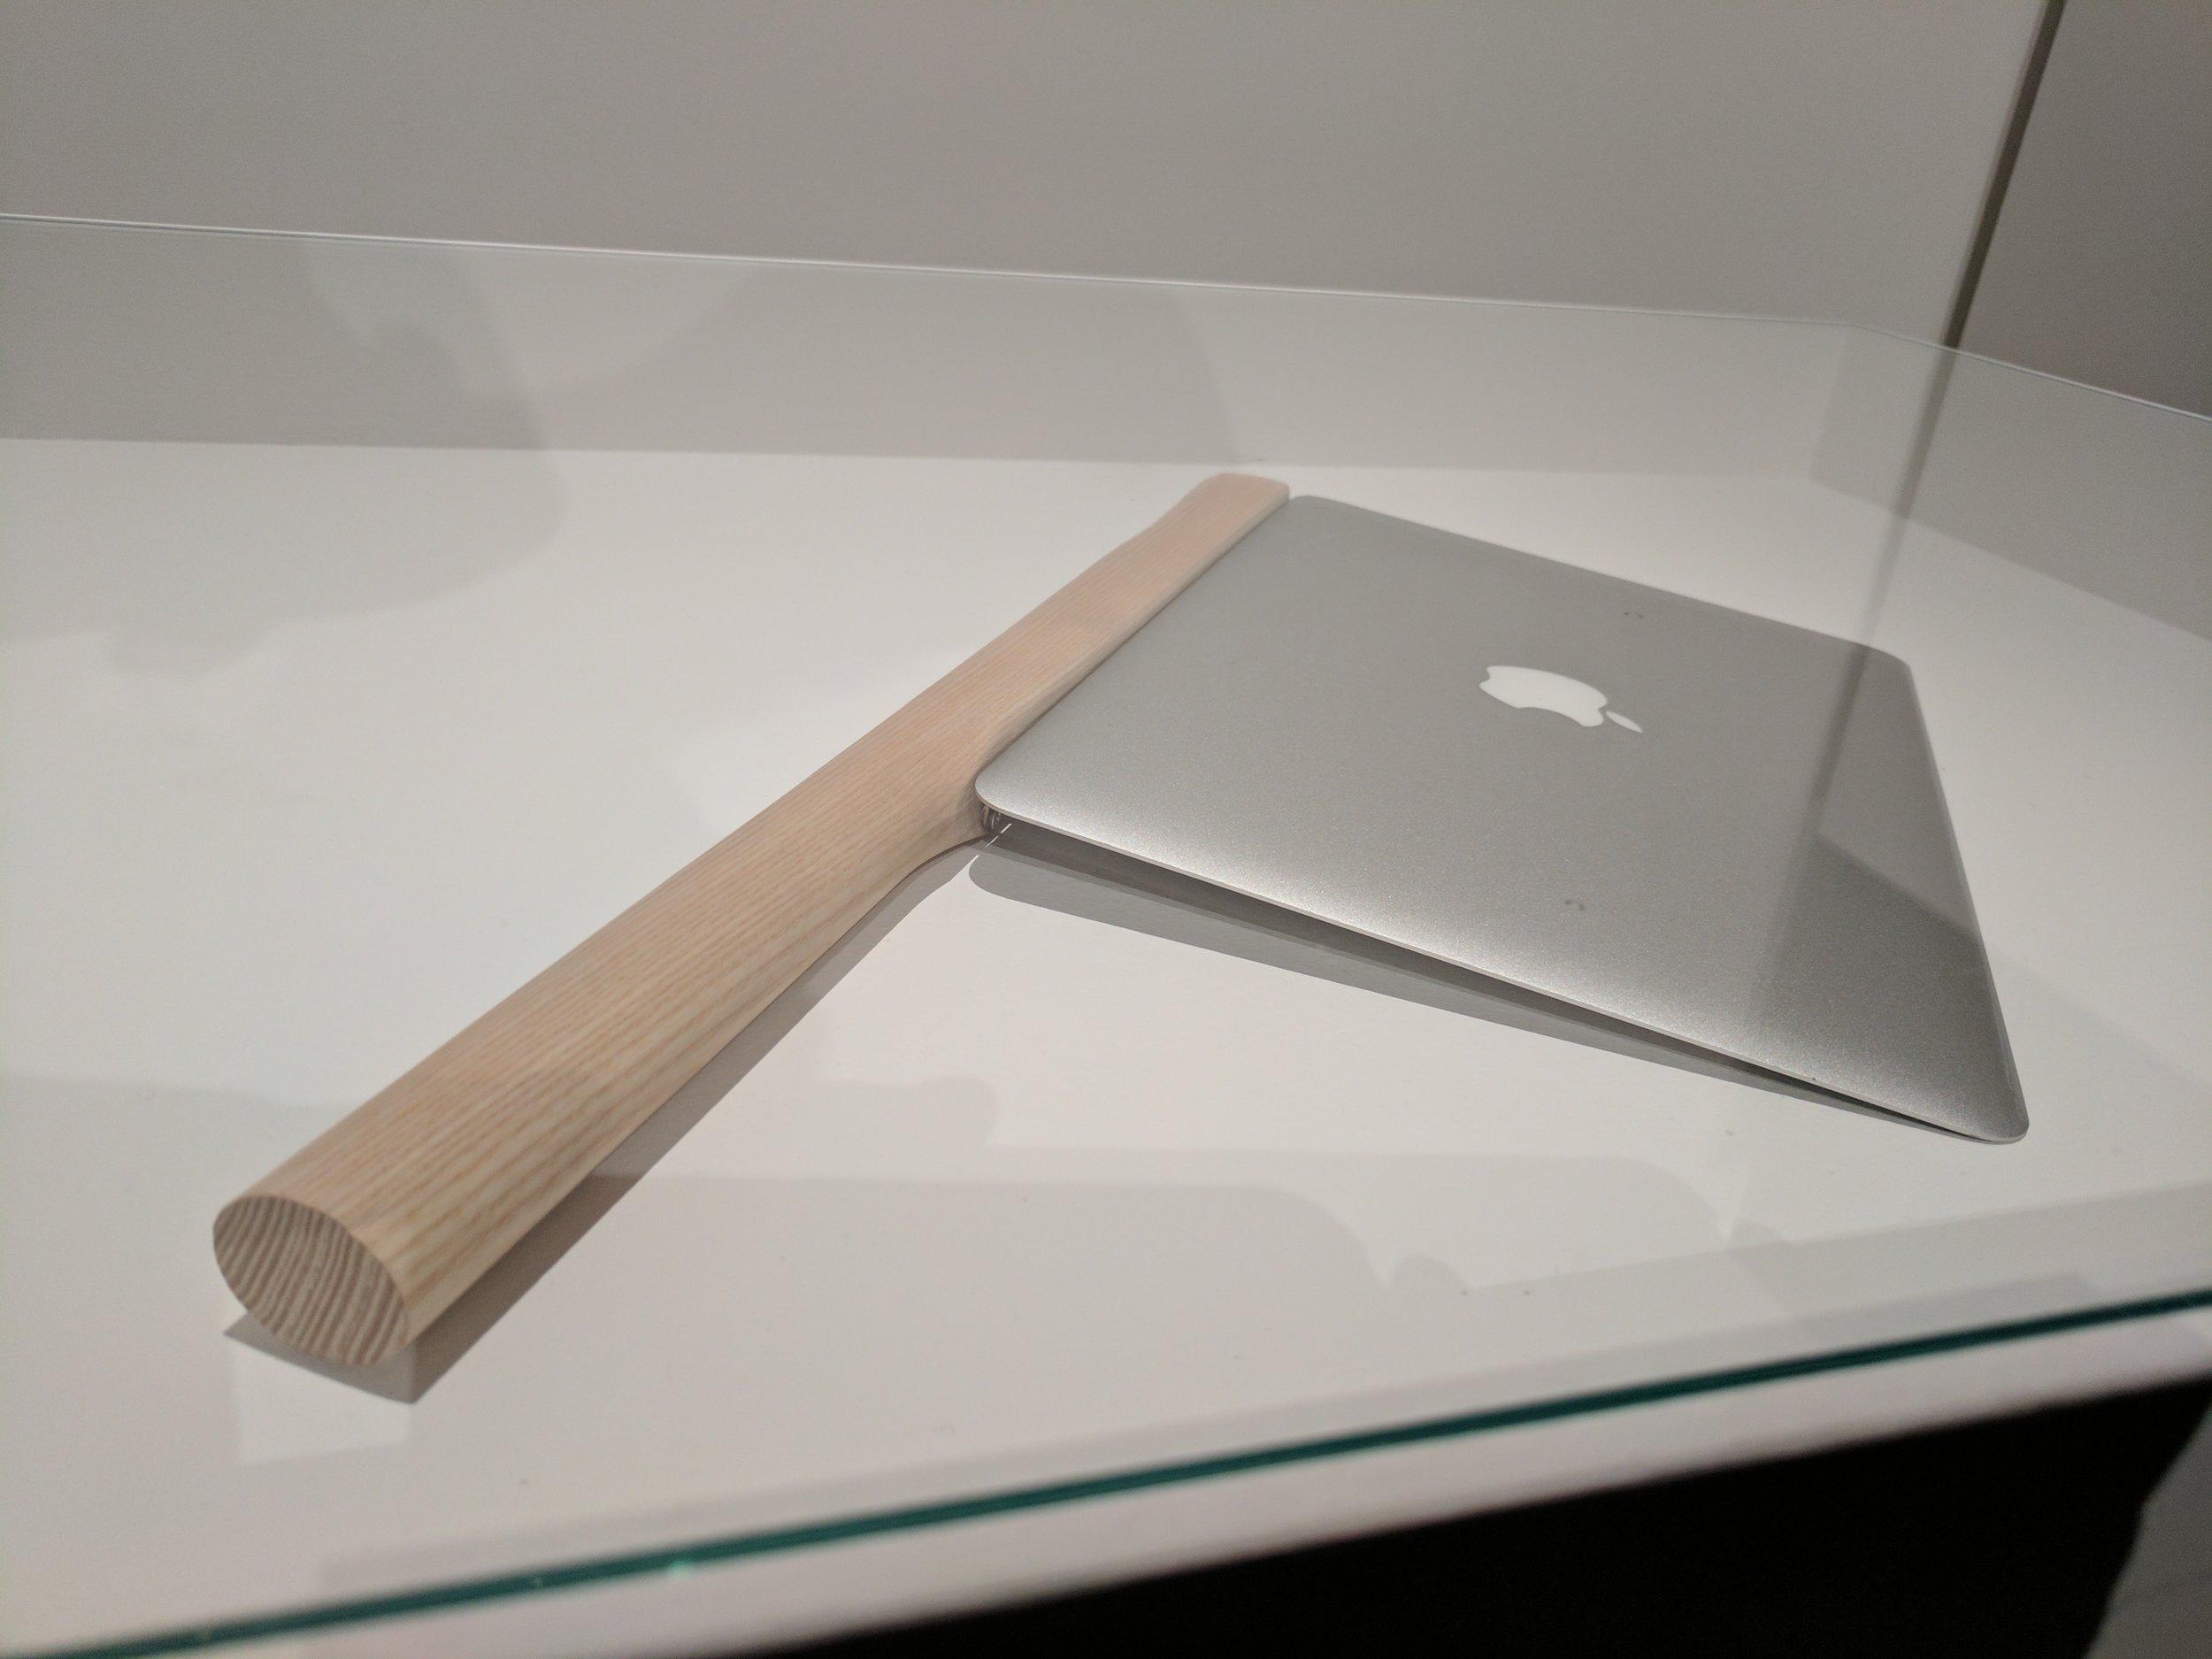 2  - Sharpening a Macbook Air by Shimabuku, 2015.jpg